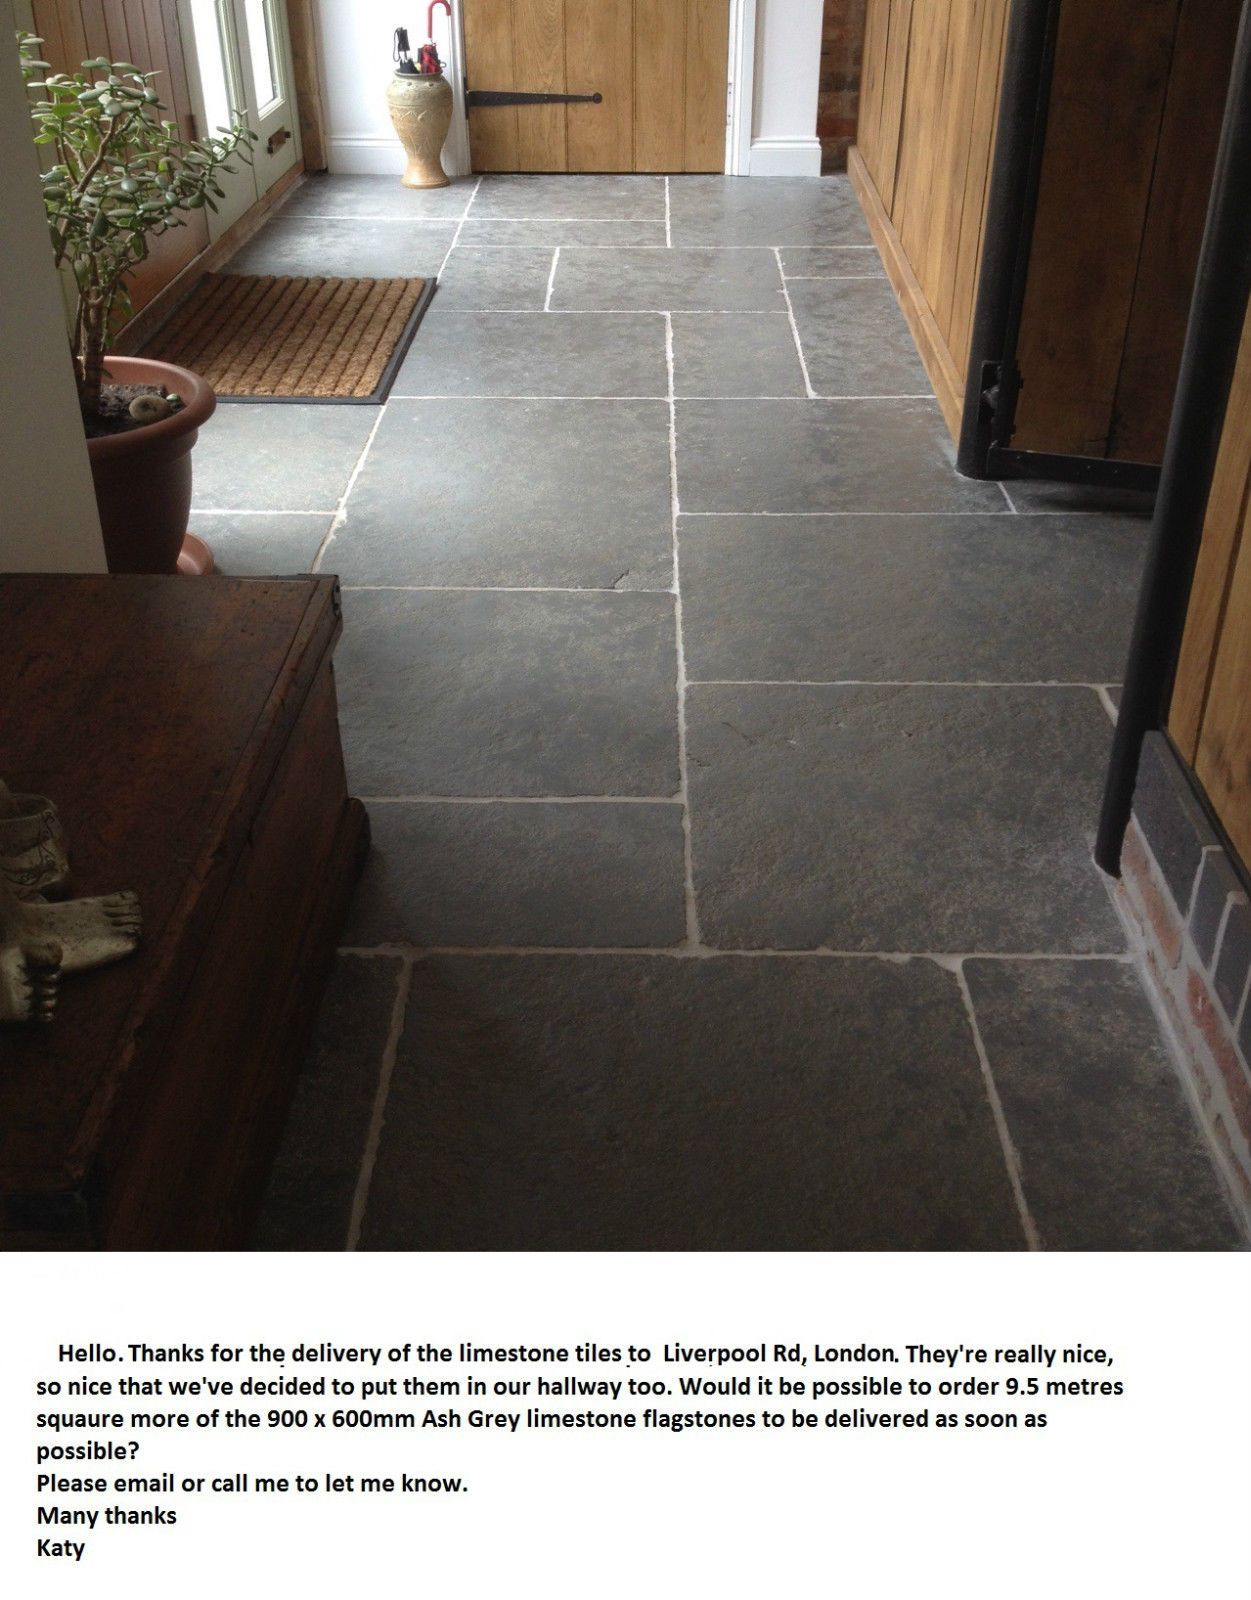 Tumbled aged ash grey limestone flagstones tiles slabs modular tumbled aged ash grey limestone flagstones tiles slabs modular pattern 20m2 doublecrazyfo Gallery